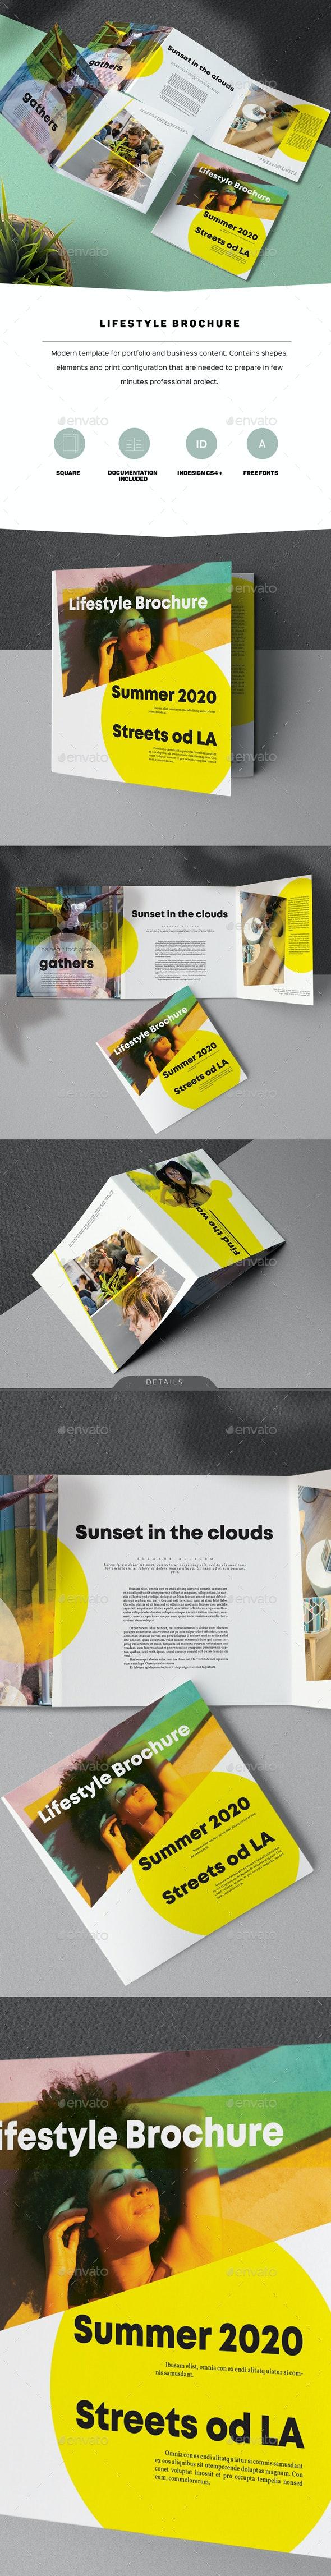 Lifestyle Brochure - Informational Brochures